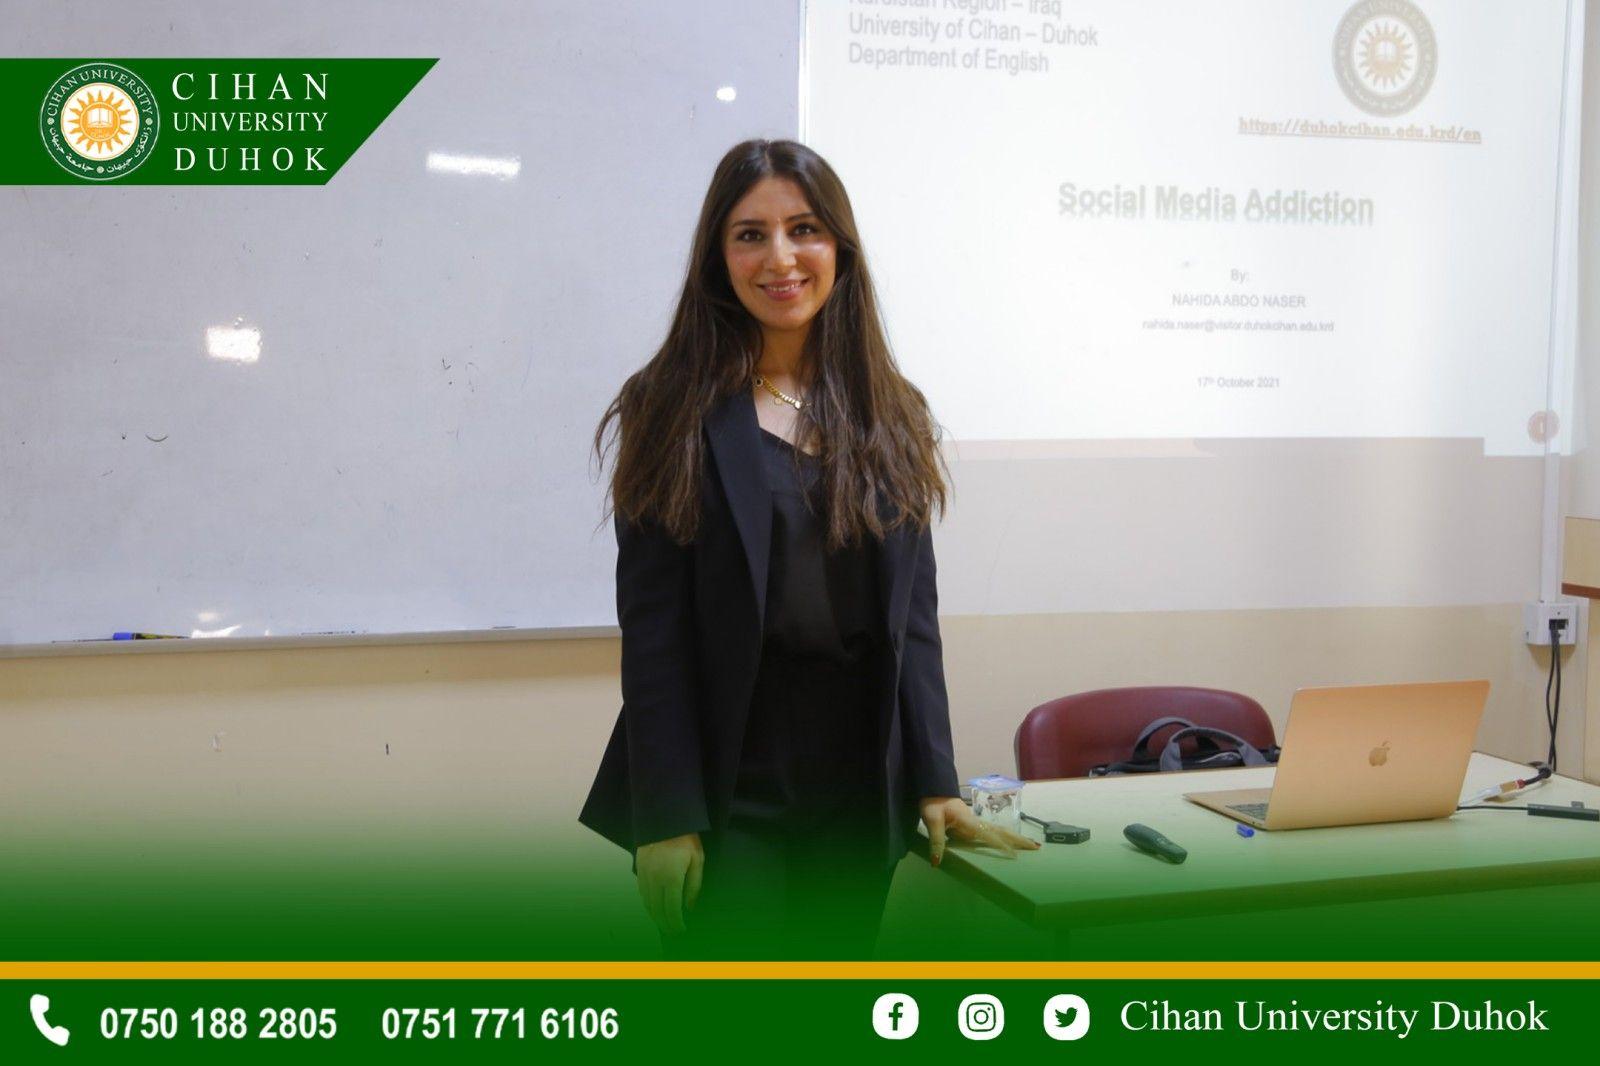 A seminar entitled :Social Media Addiction